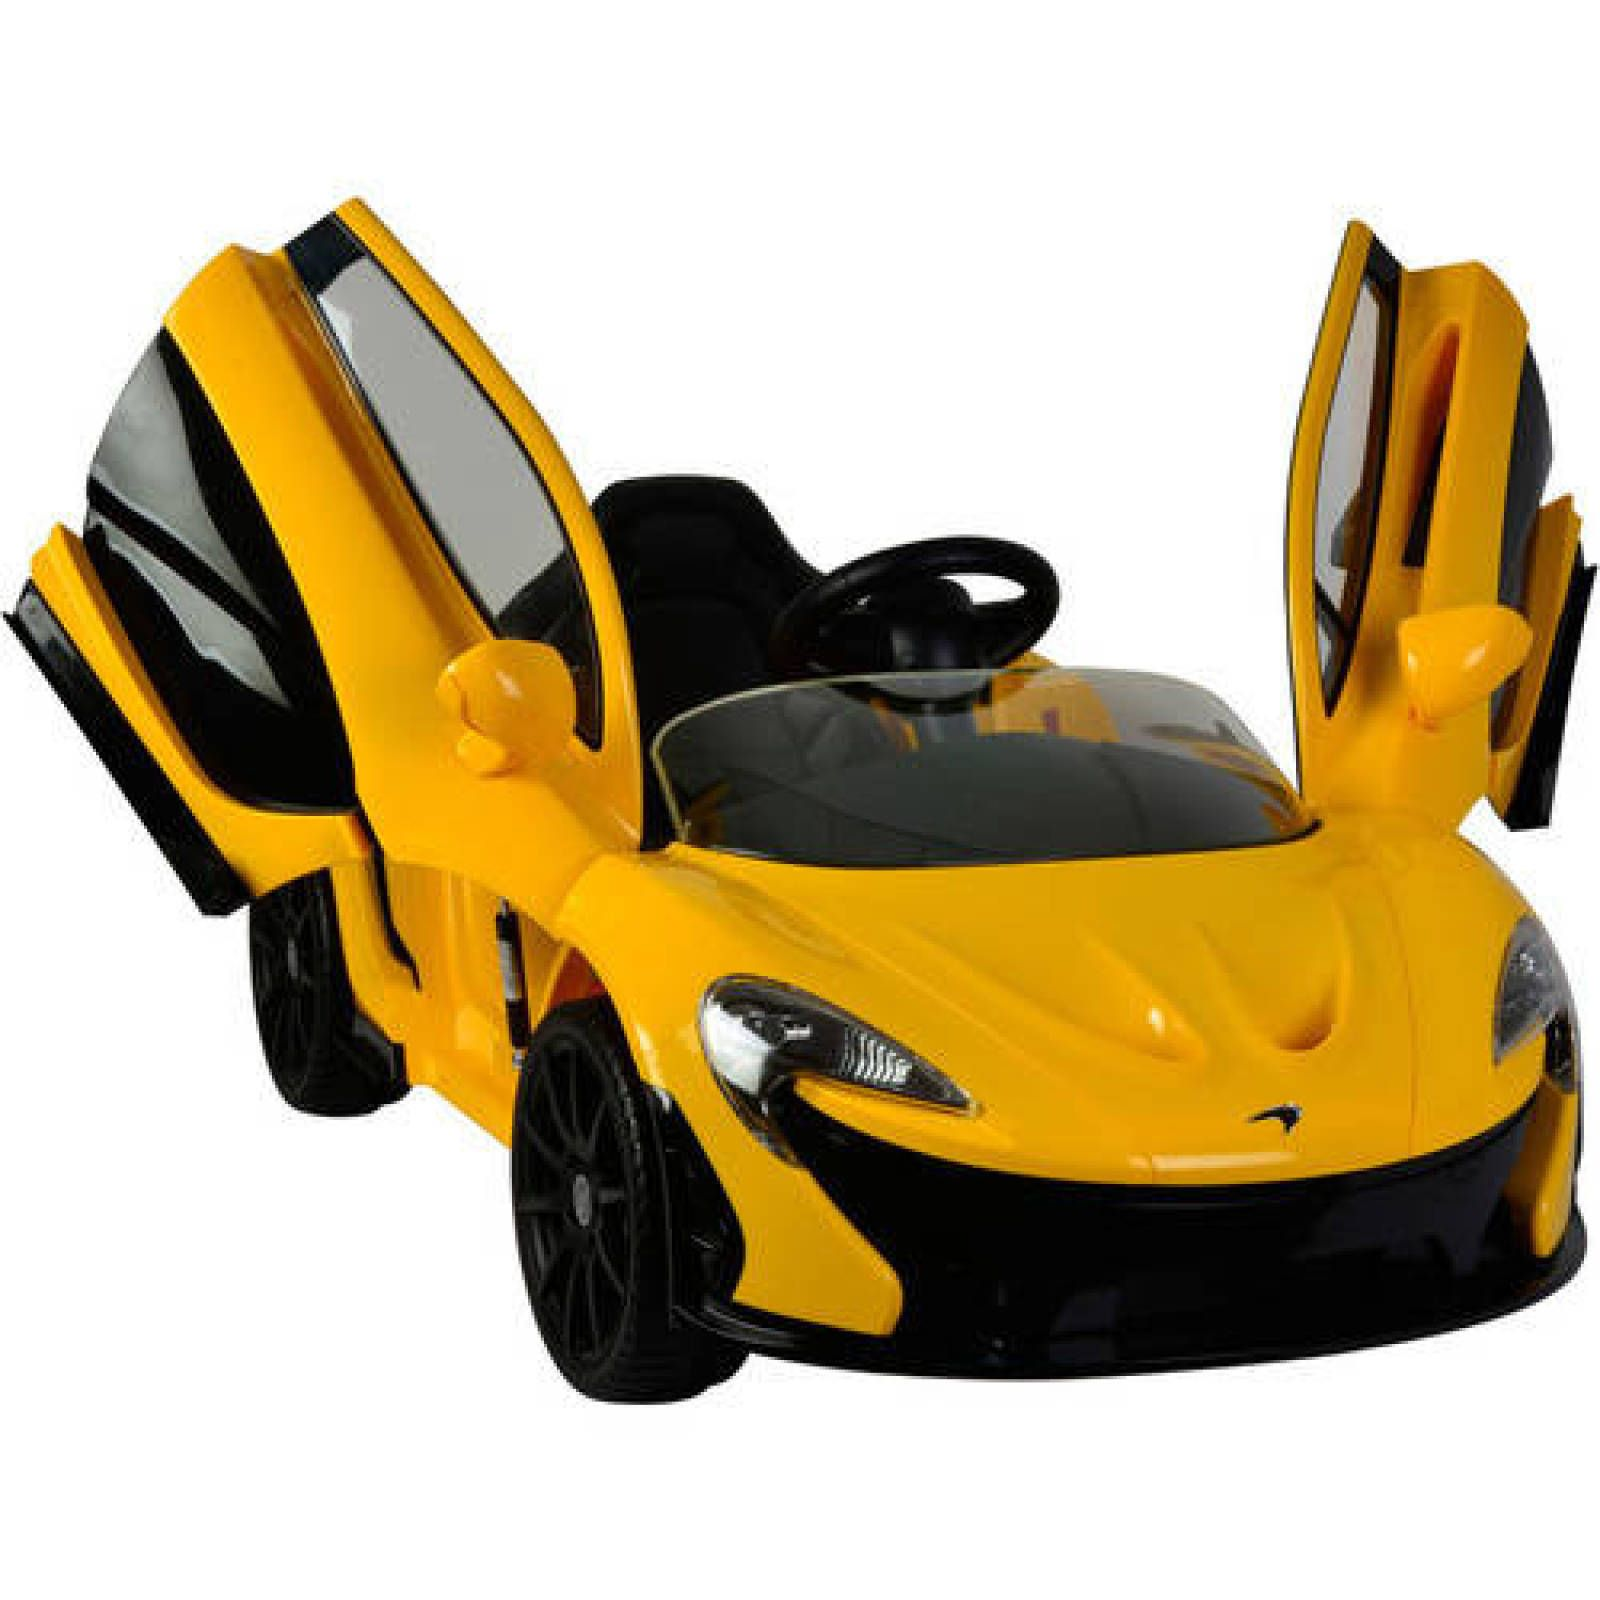 Battery Powered Ride On Toys Kids Car Mclaren P1 Toddler Children Riding Outdoor Carros Para Crianças Carros Infantil